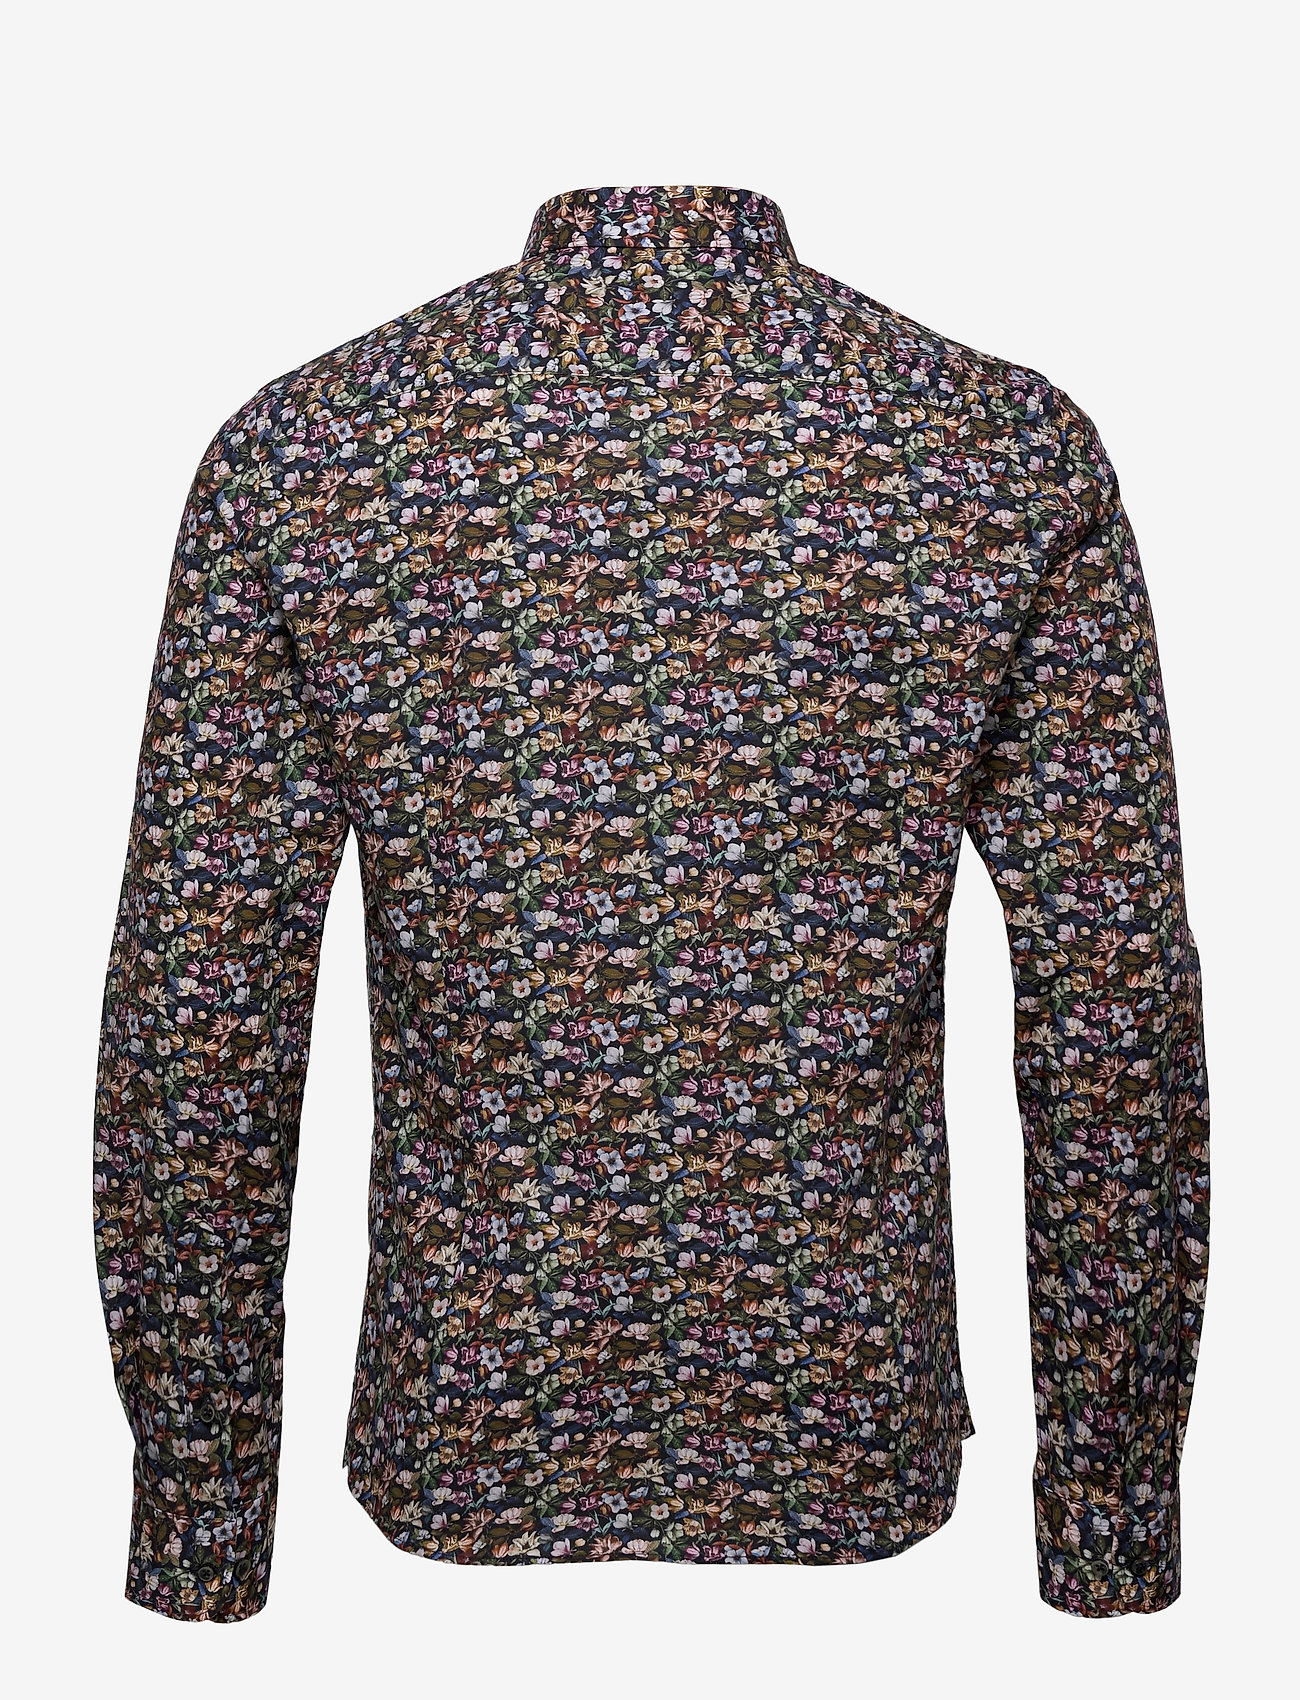 SAND - 8644 - Iver 2 - casual skjortor - pattern - 1